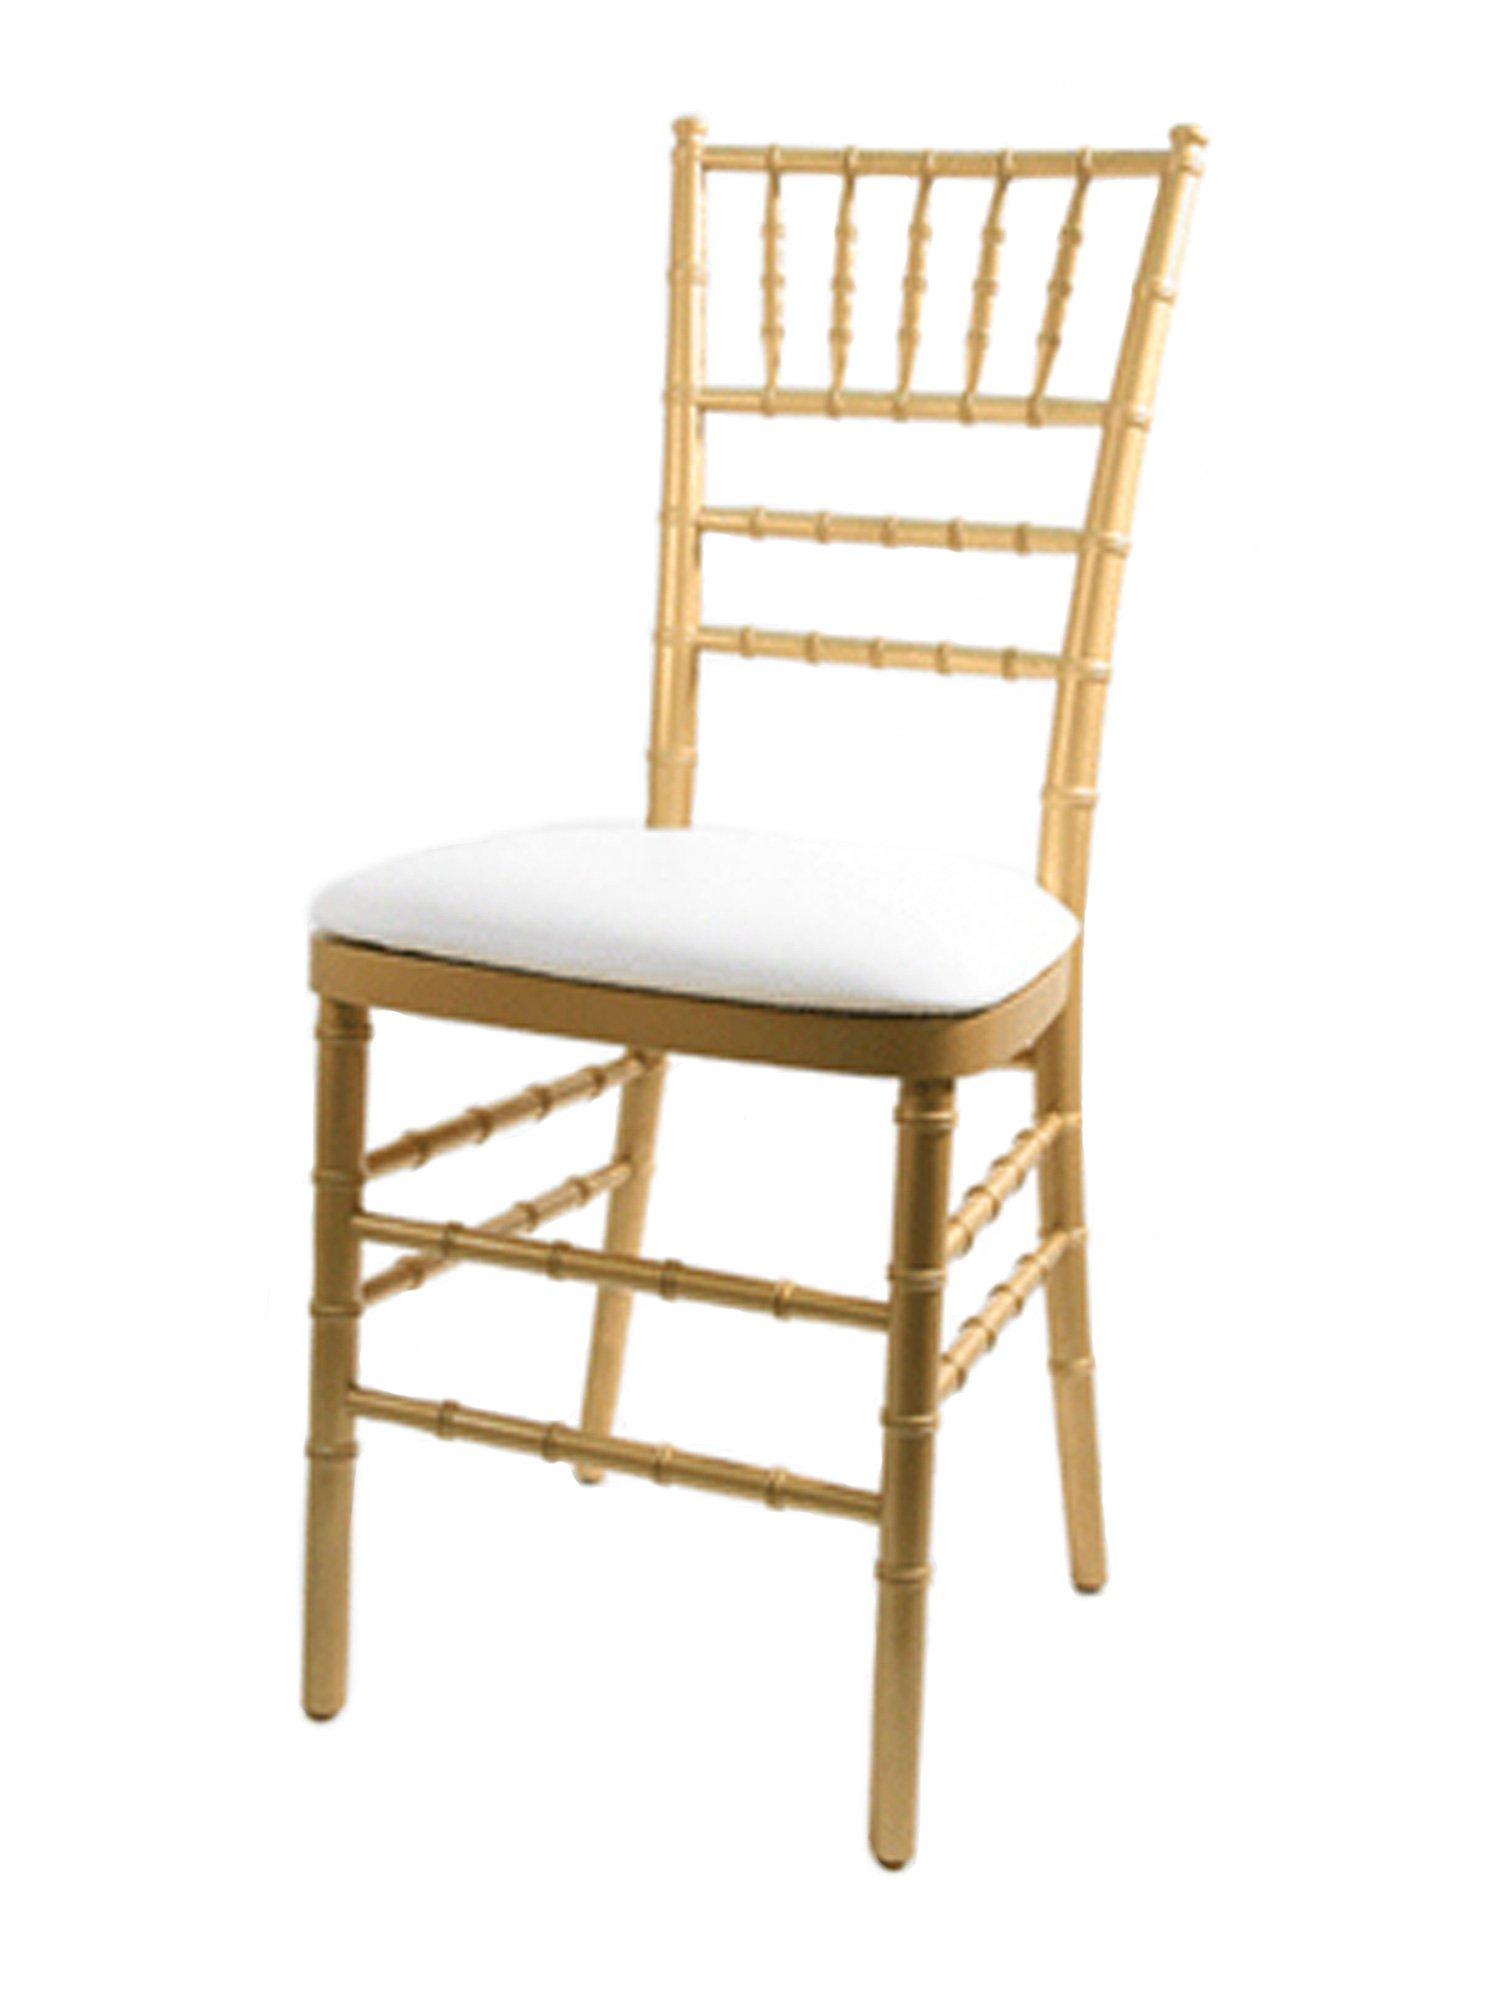 CSP Events Cup-RB-Vinyl-WH Chiavari Chair Wood Panel/Vinyl Cushion, 3'' Height, 15'' Width, 15'' Length, White